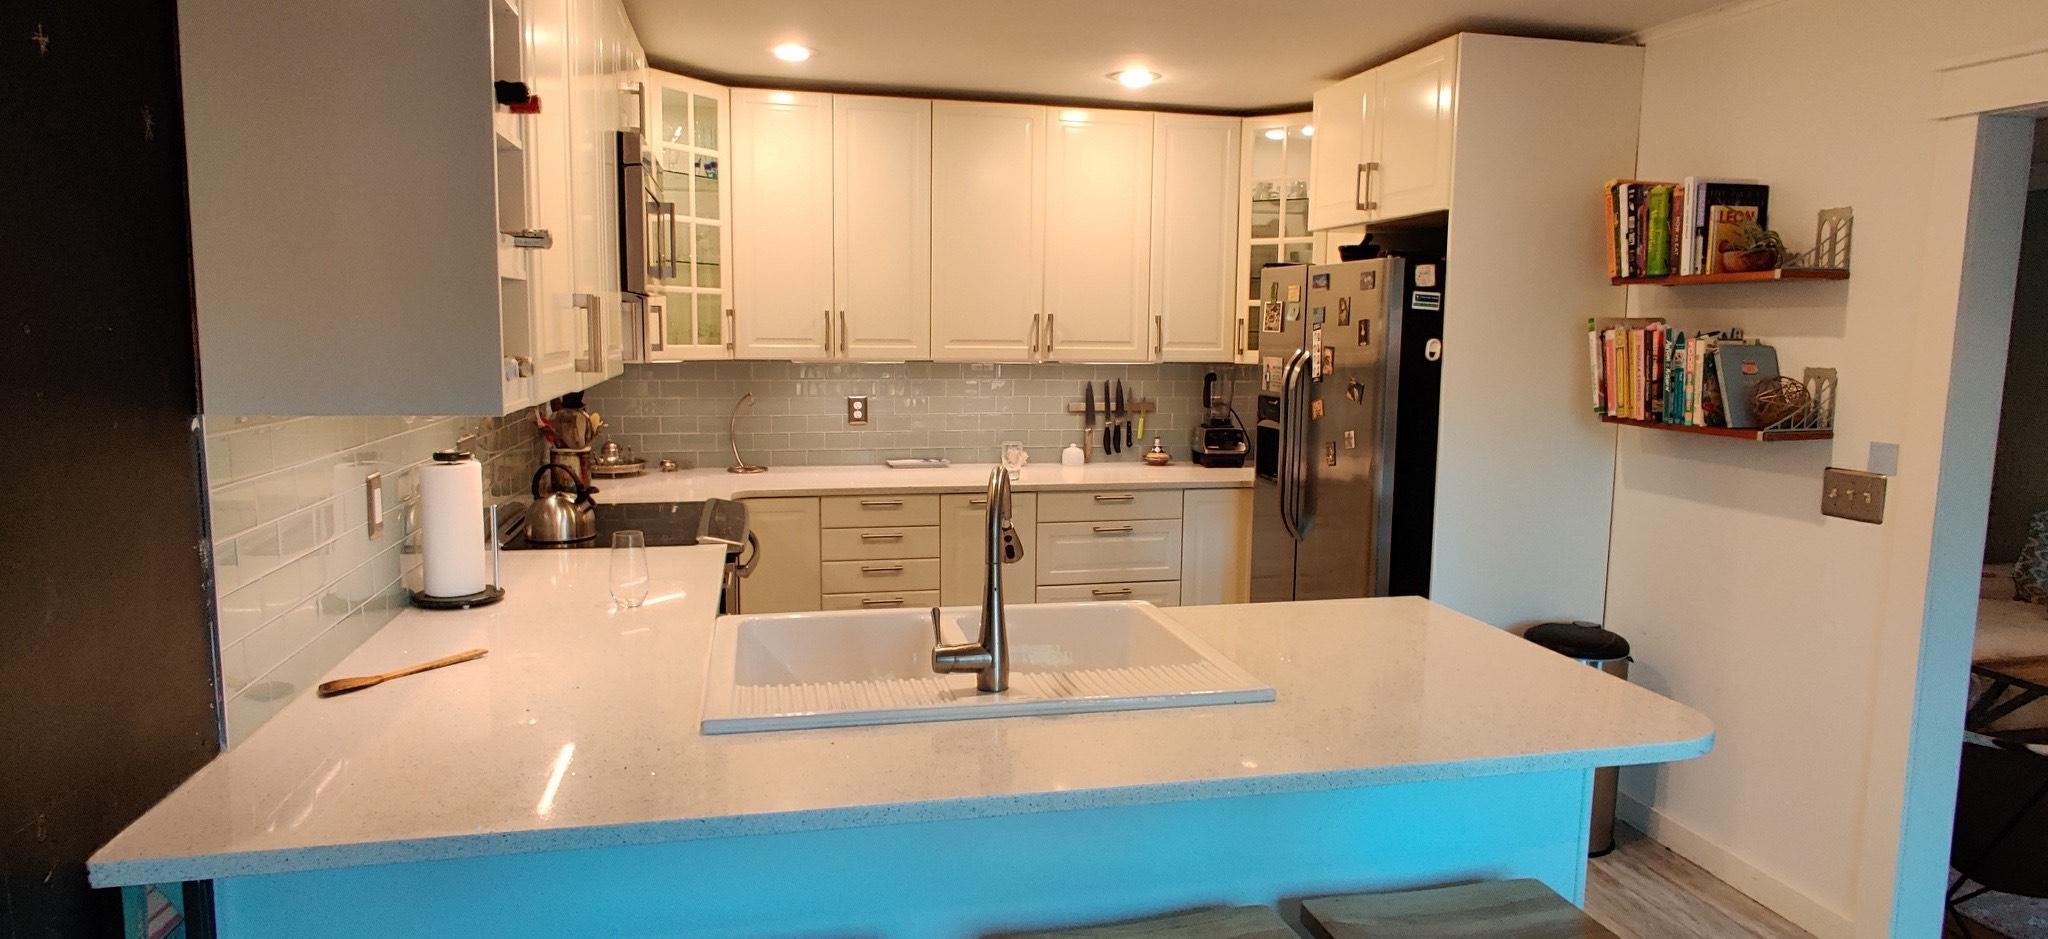 Shemwood II Homes For Sale - 950 Sea Gull, Mount Pleasant, SC - 12